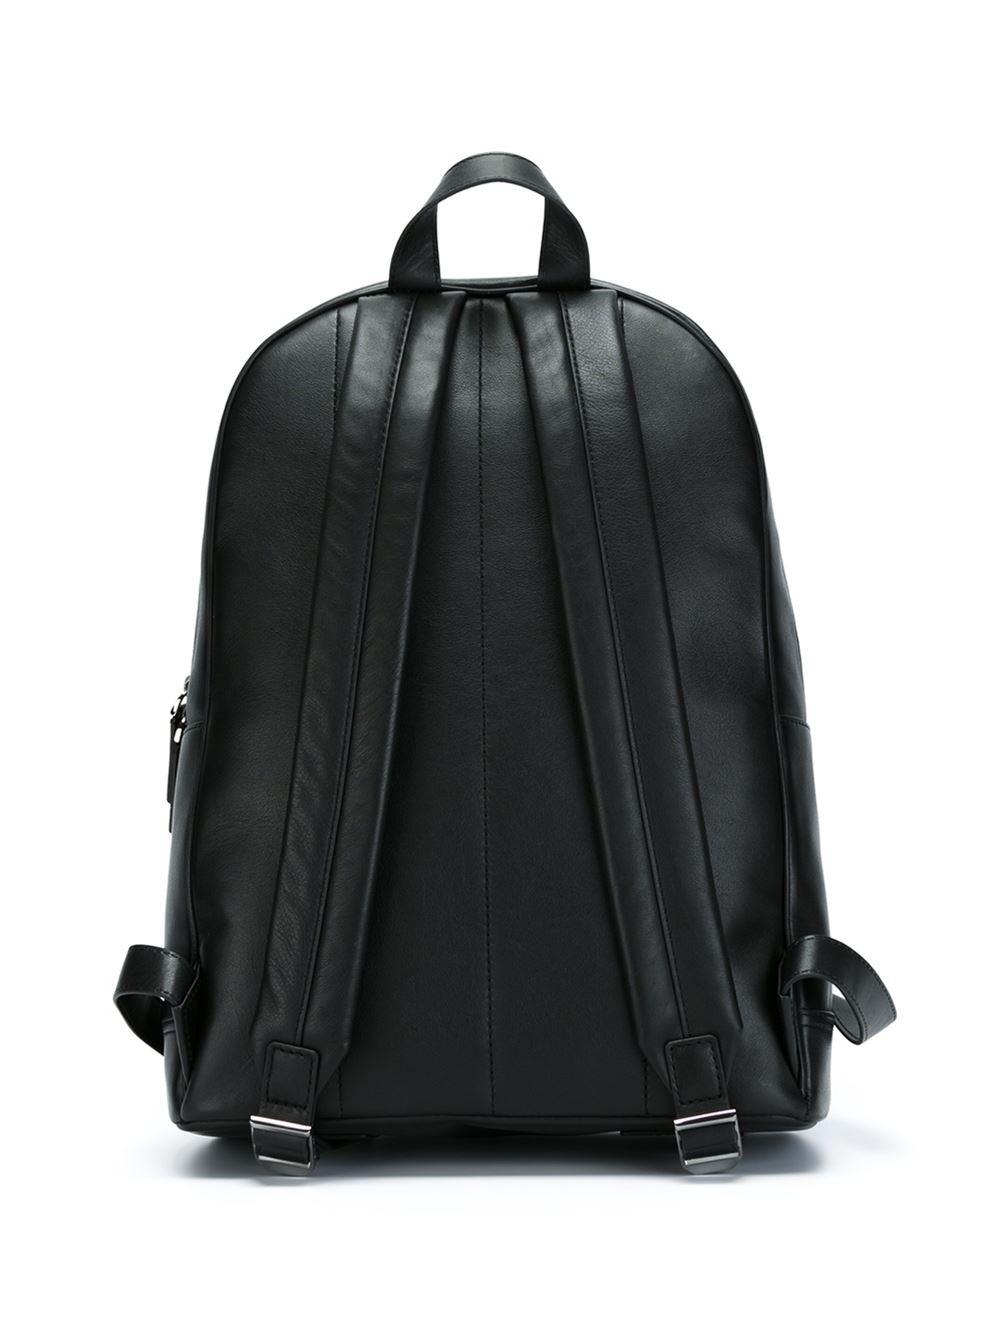 00a2ebef96 Lyst - Michael Kors  kent  Backpack in Black for Men